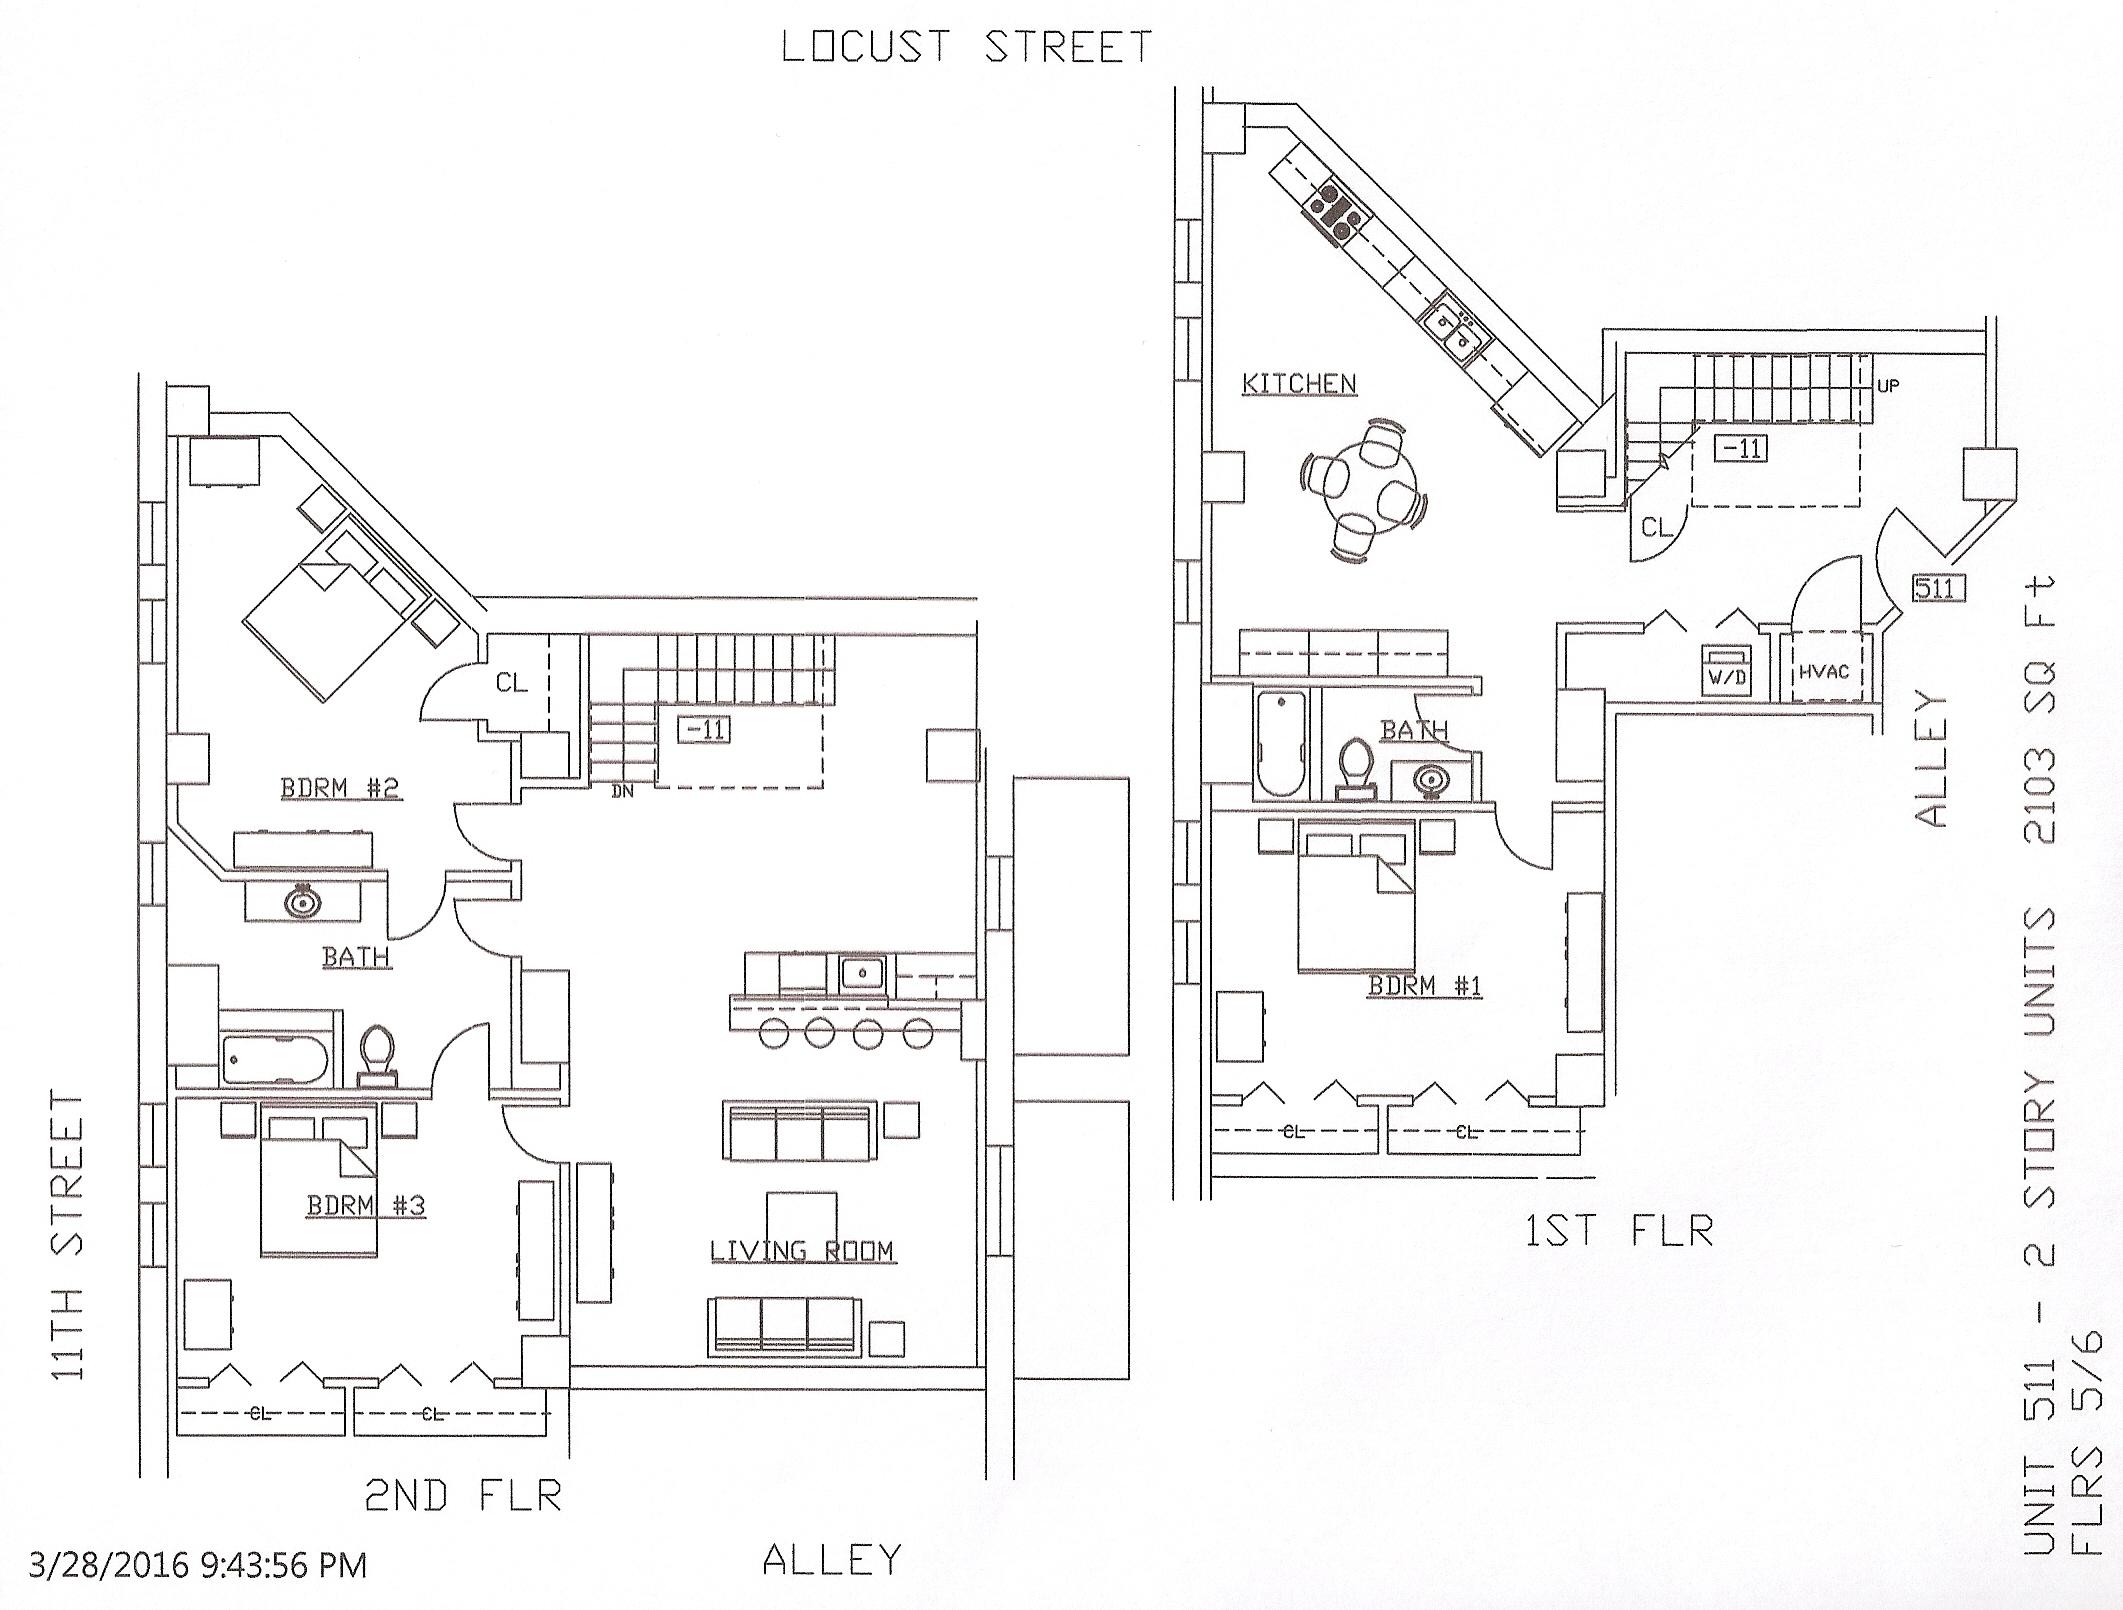 Unit 511, 2103 Square Feet